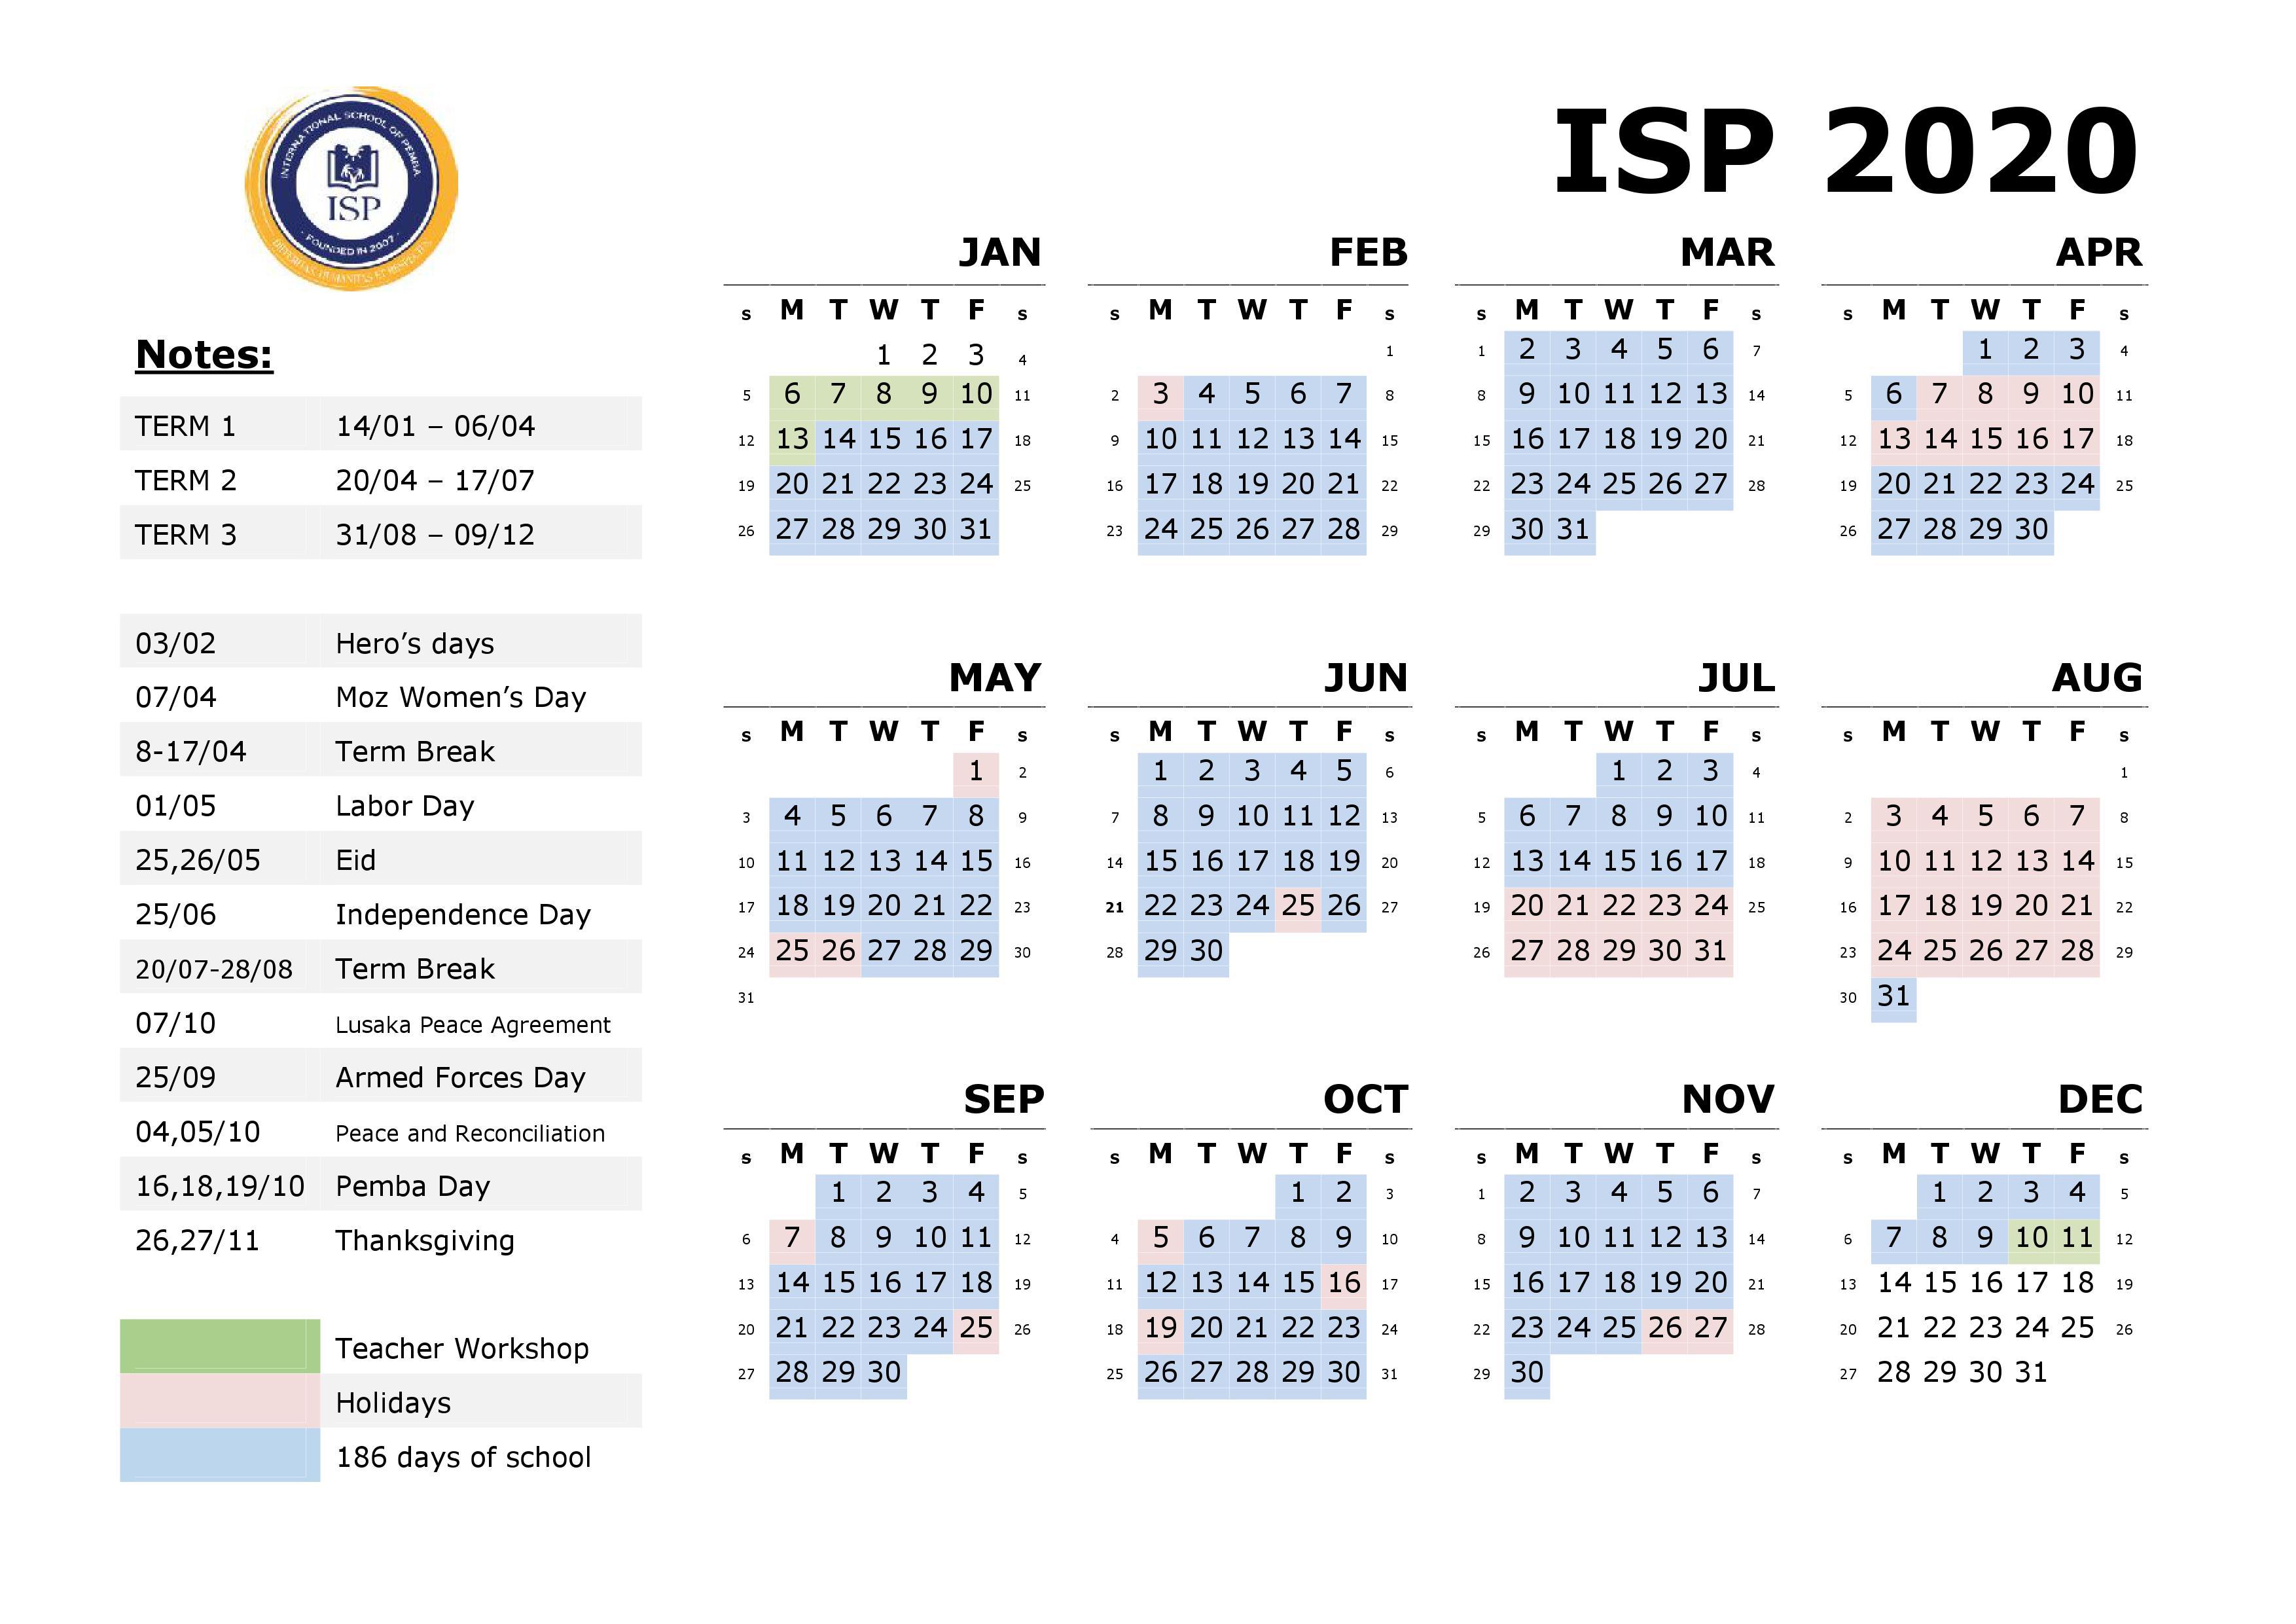 ISP Calendar 2020 update